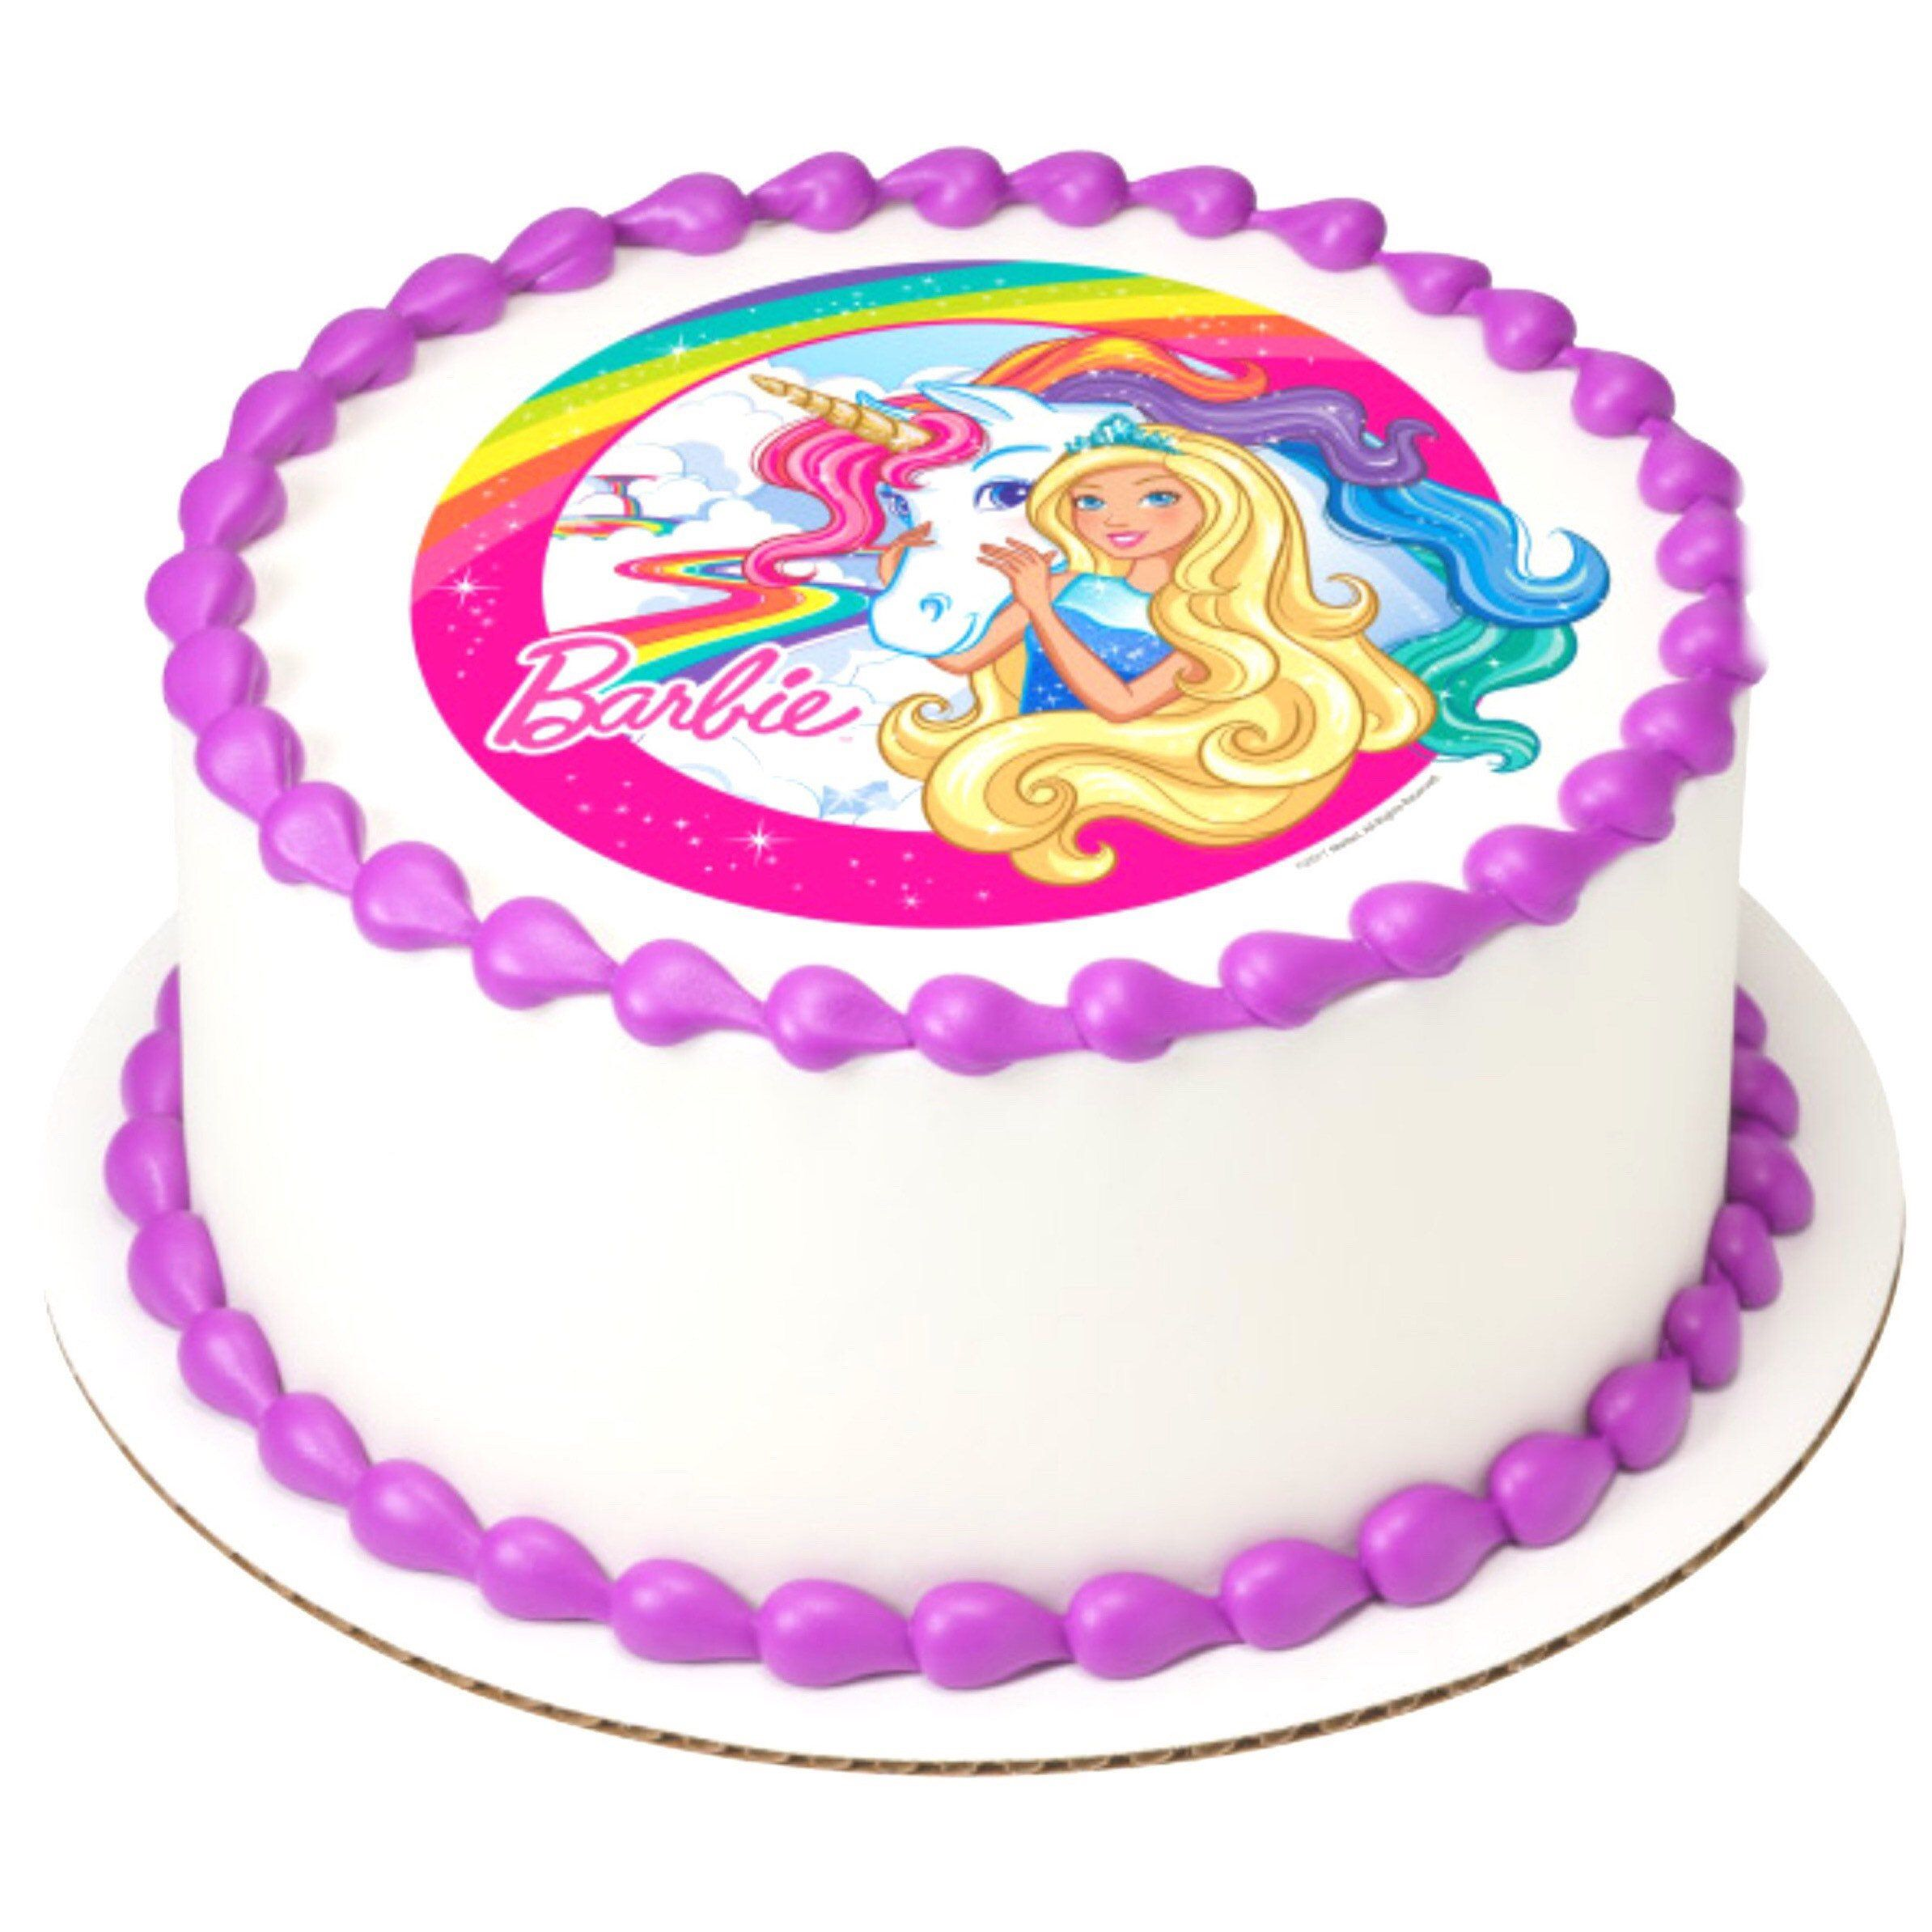 Unicorn white personalised edible cake topper//decoration